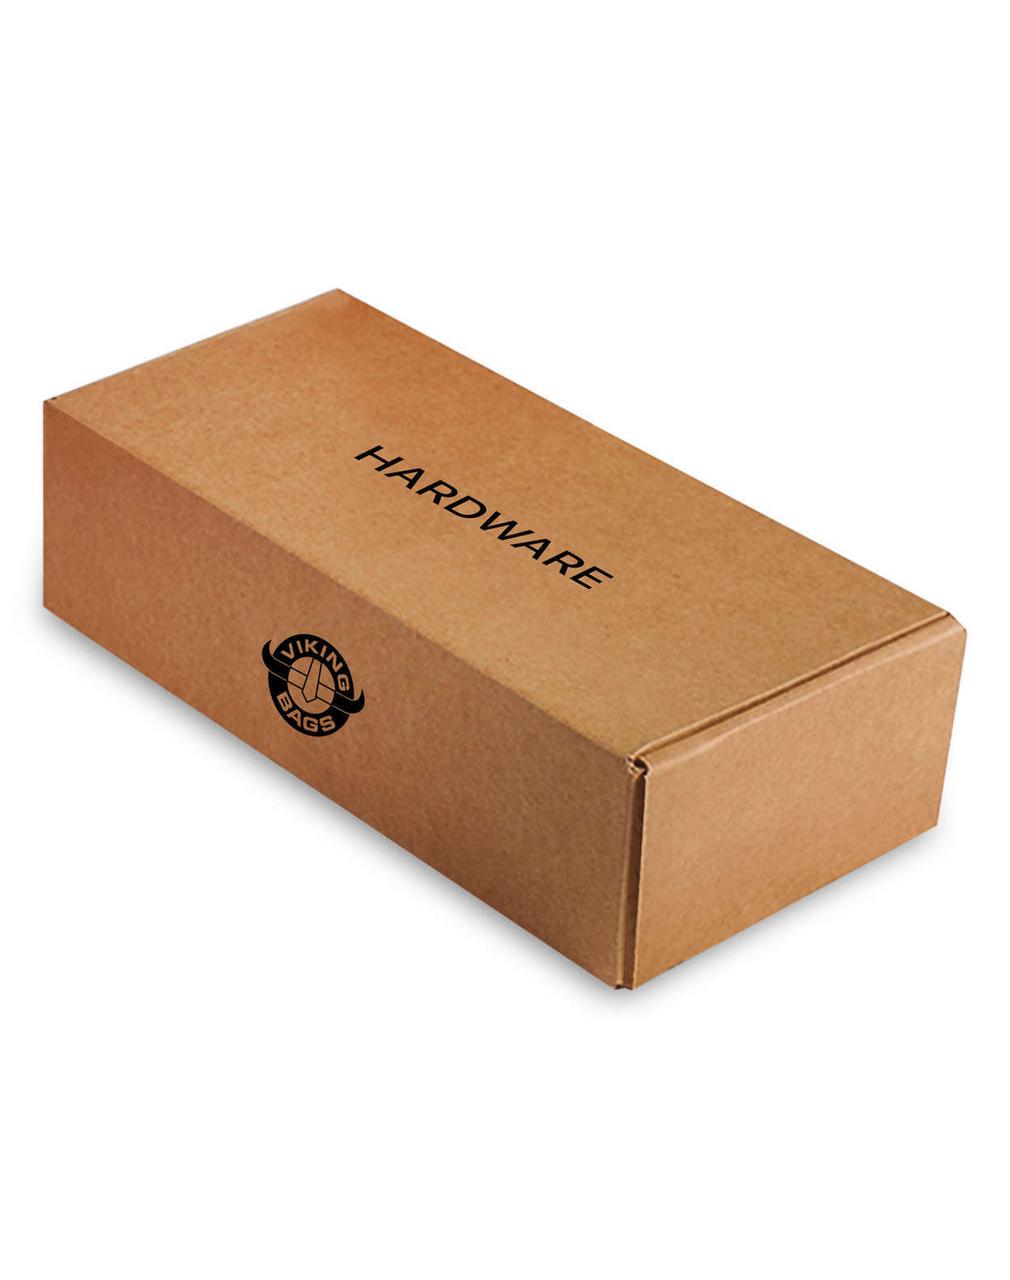 Victory Boardwalk Viking Lamellar Extra Large Leather Covered Non-Shock Cutout Saddlebags Hardware Box